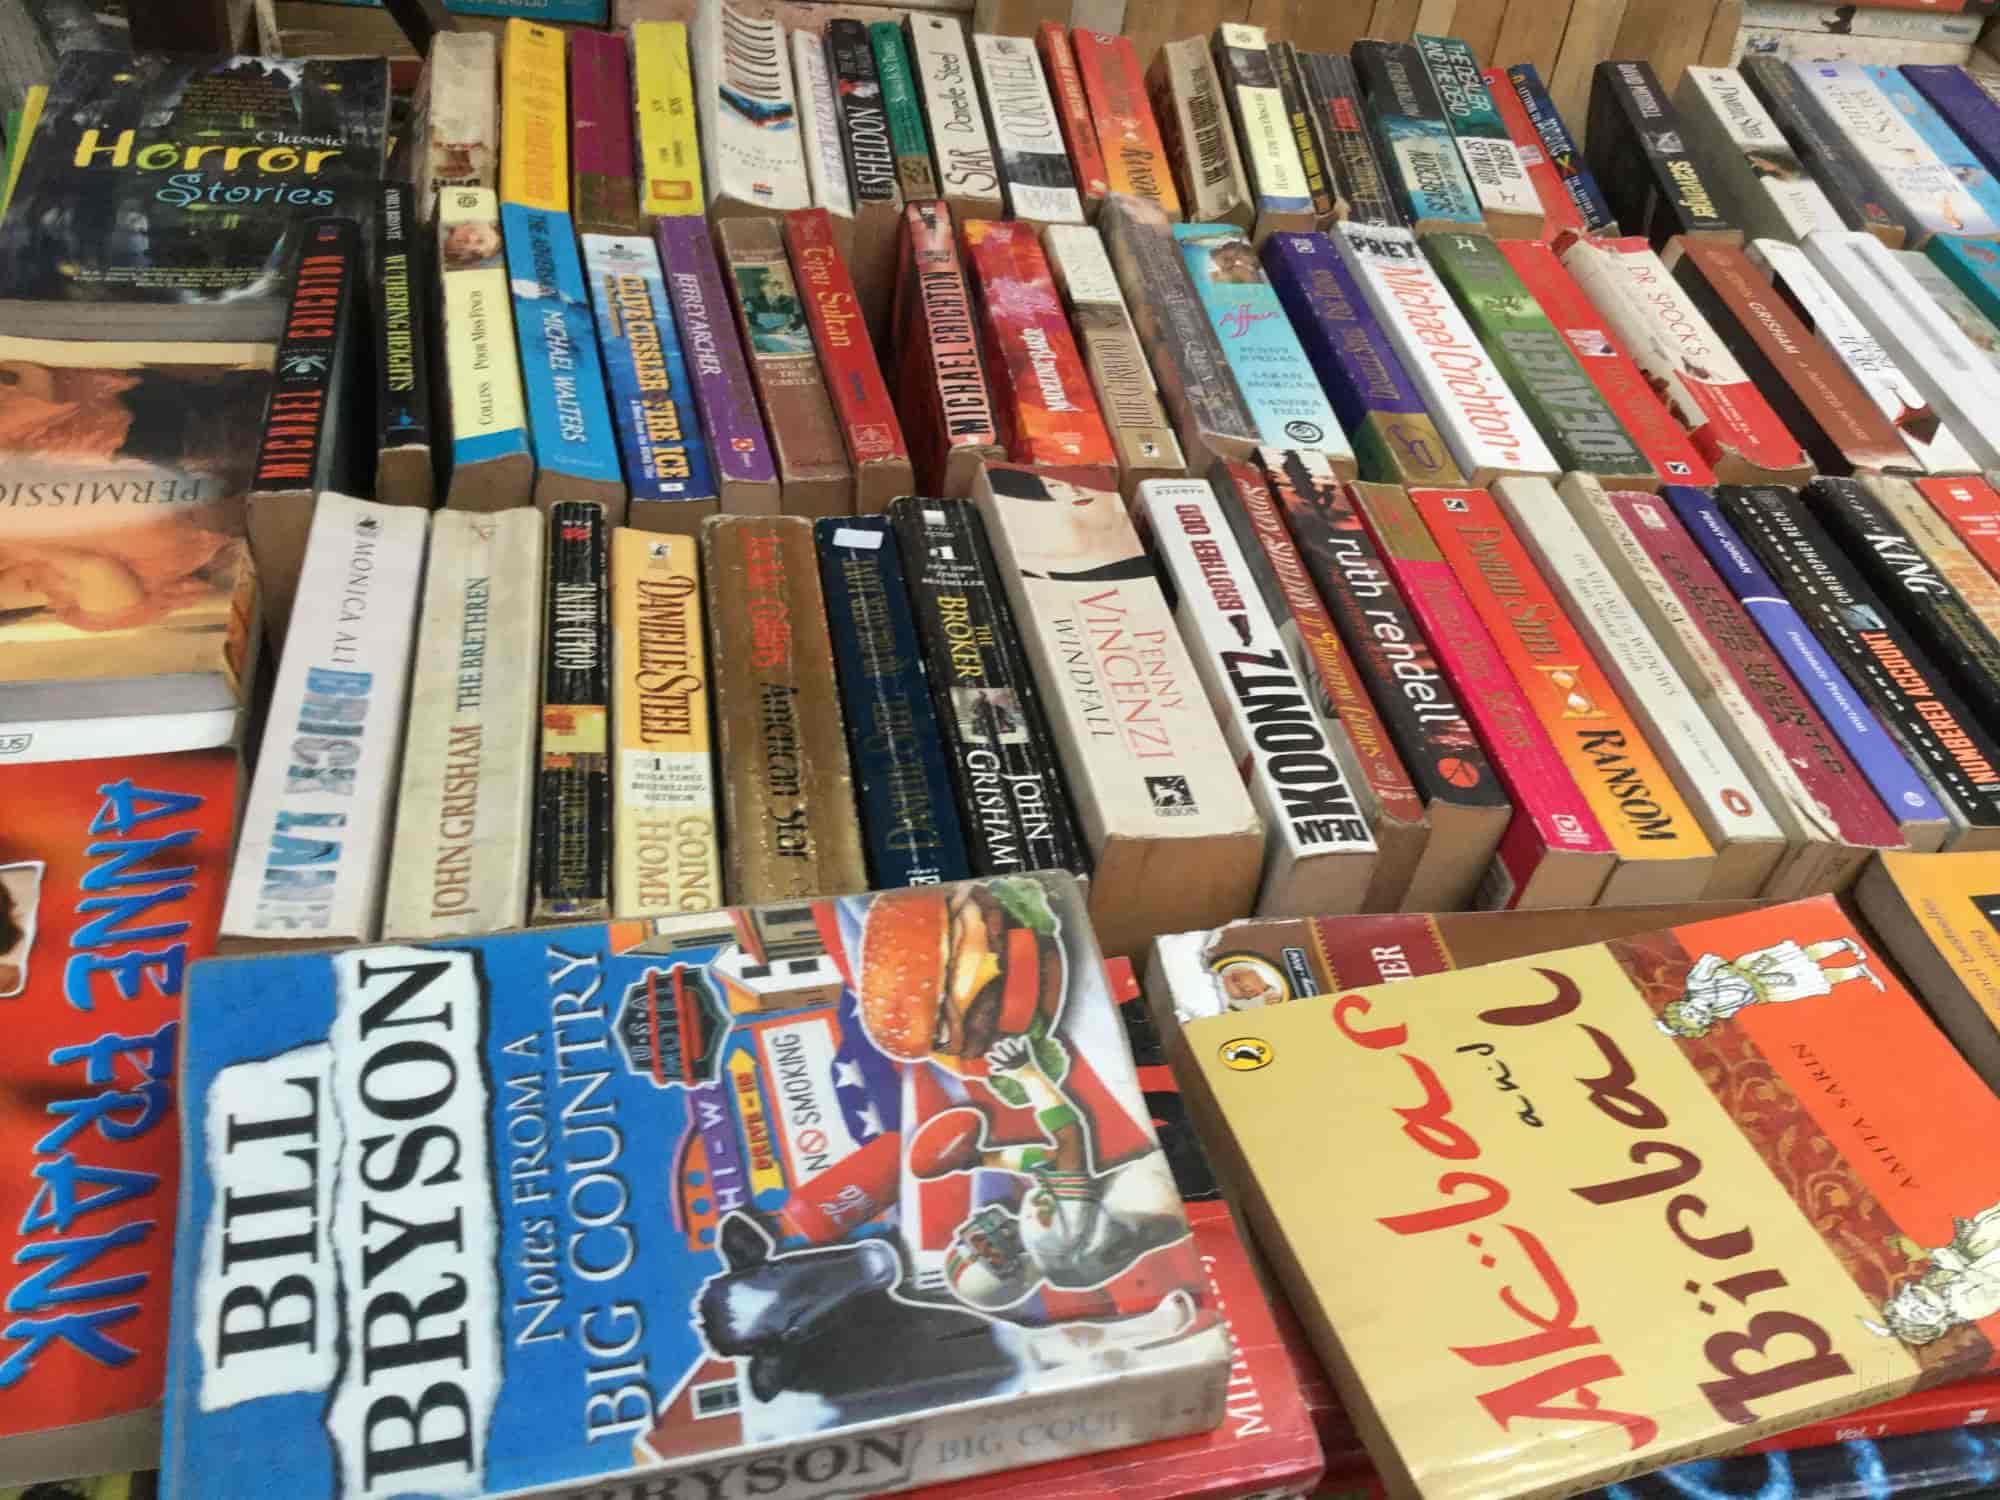 Raju Book Store, Saket - Book Shops in Delhi - Justdial